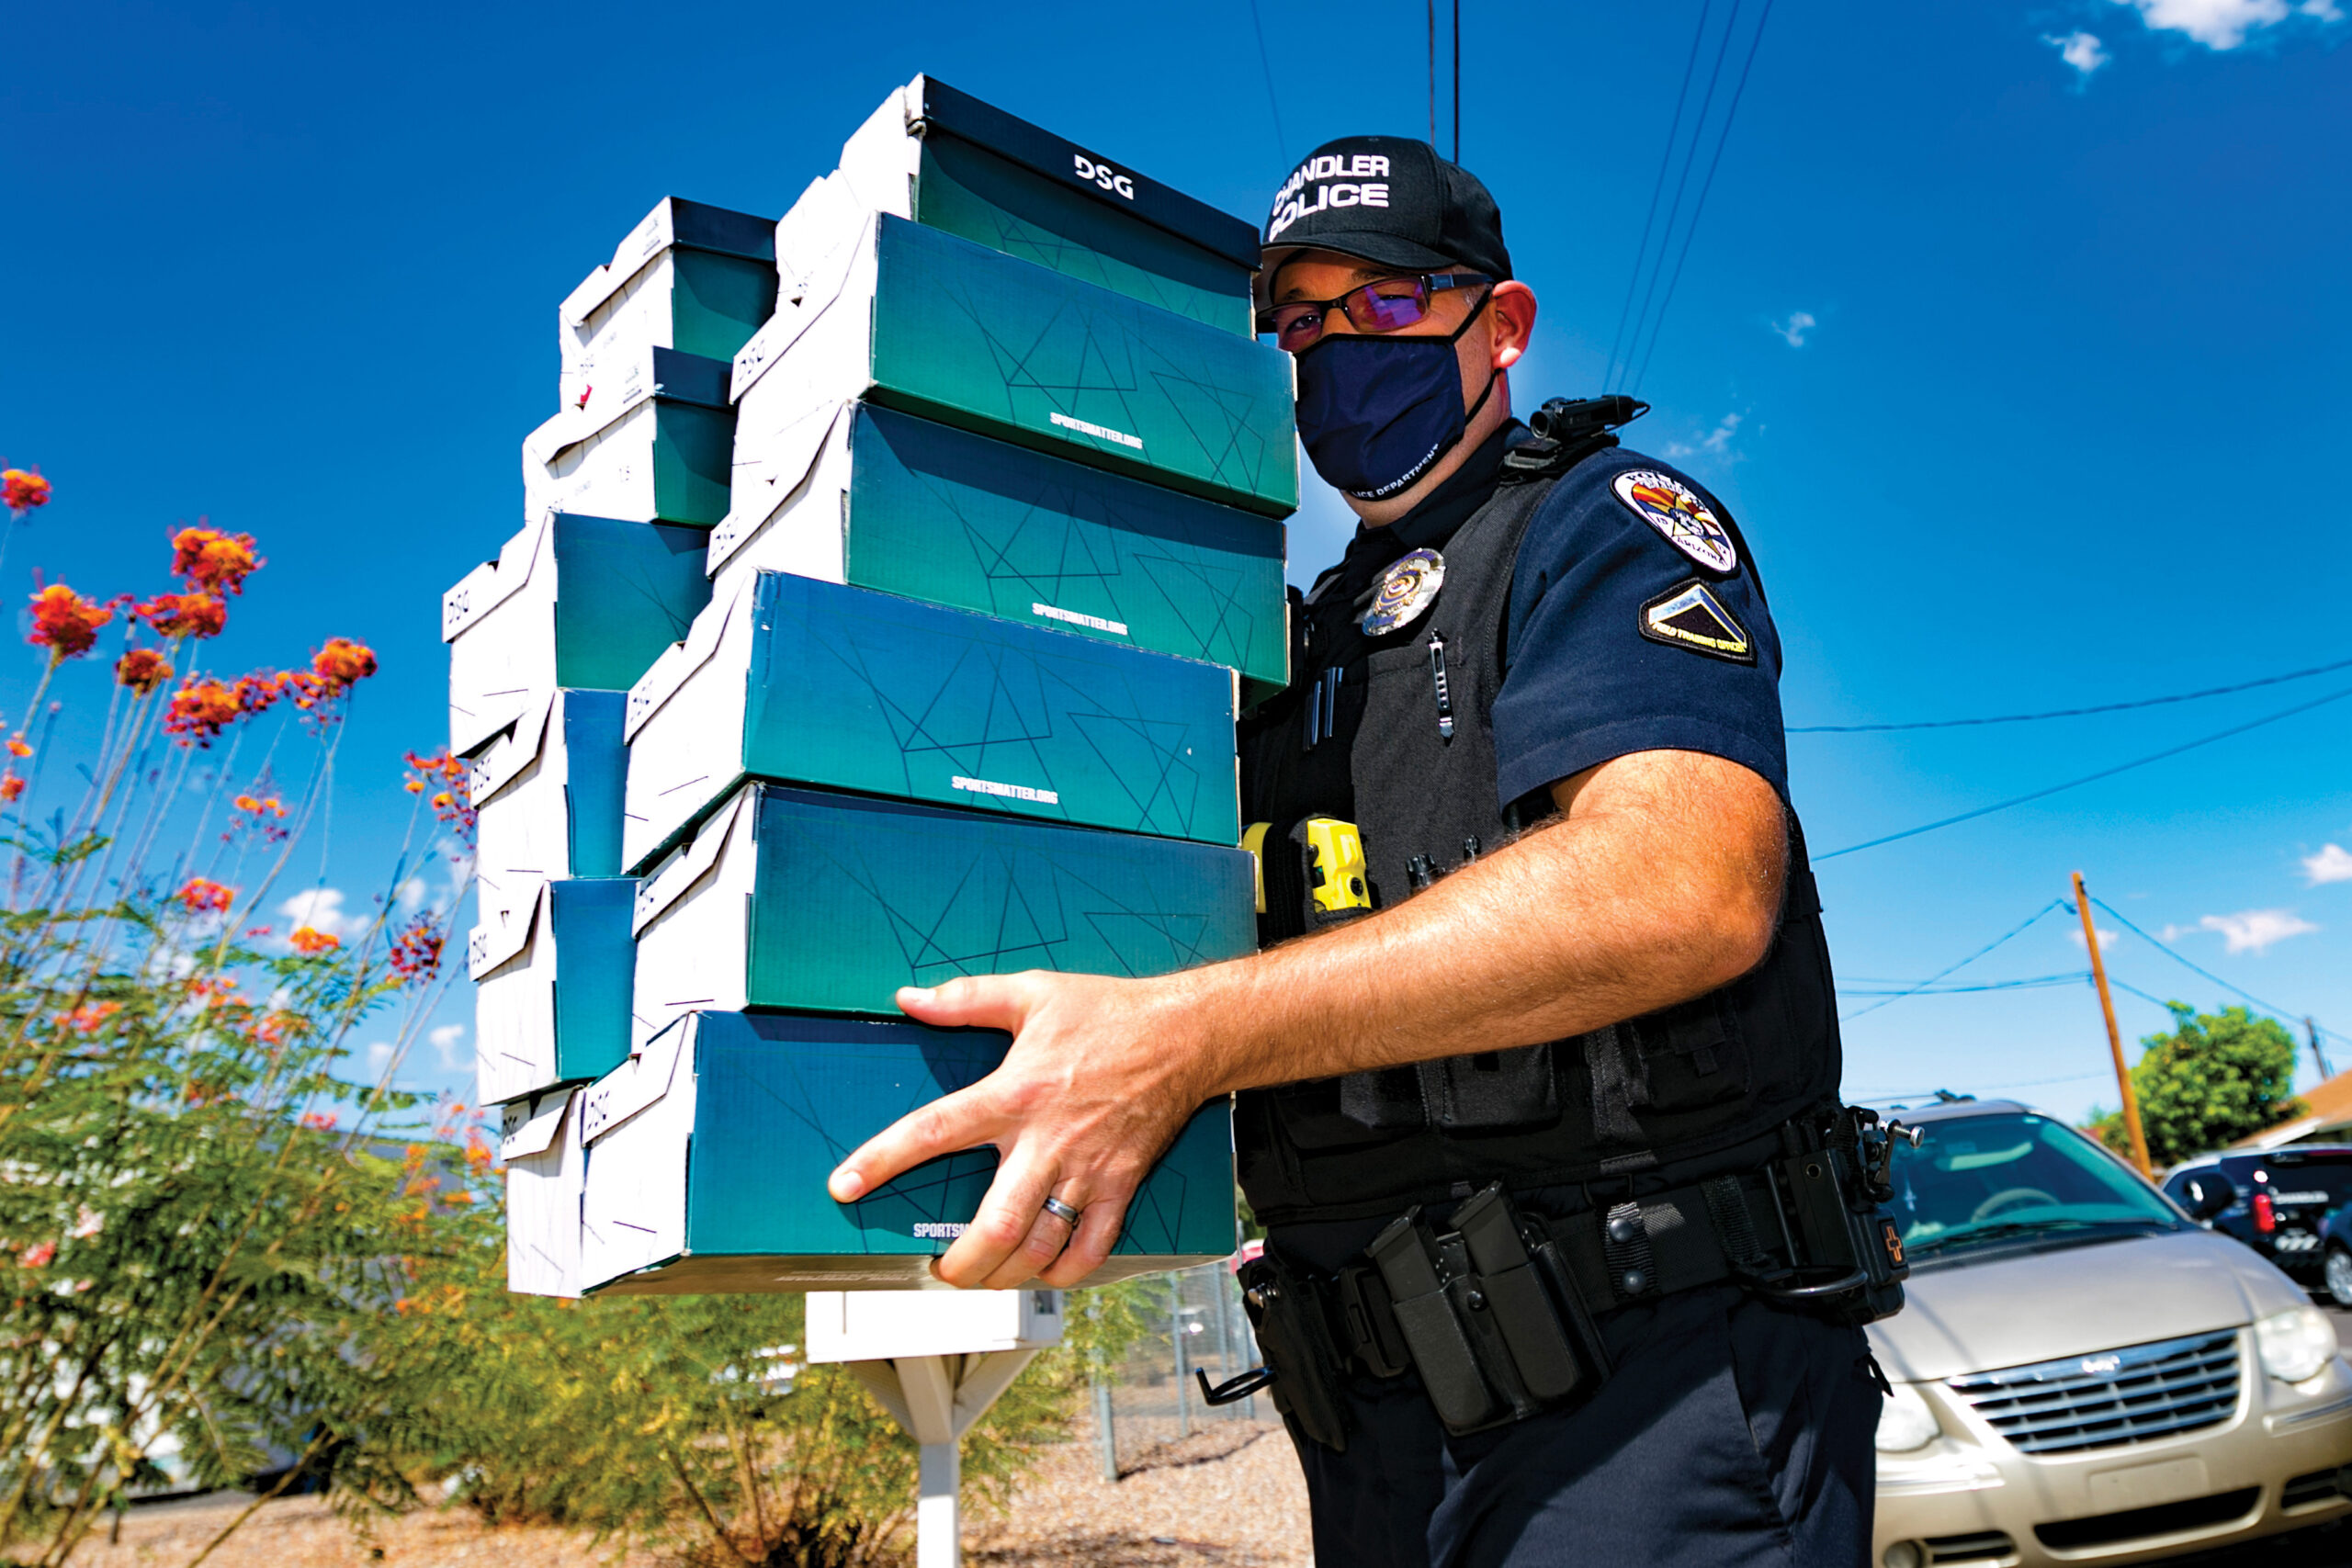 Chandler Police Department Officer Hansen